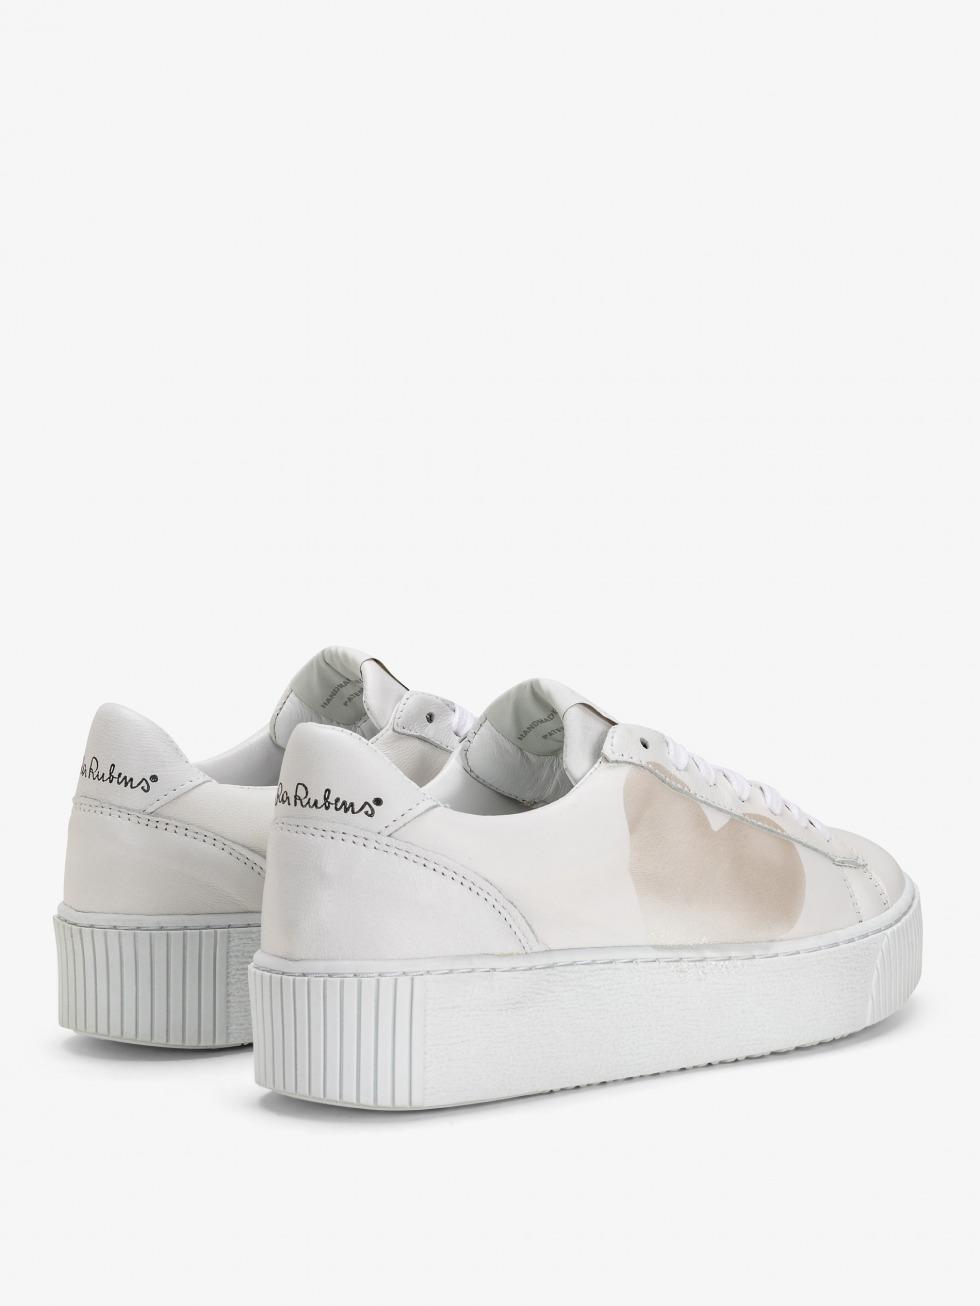 Cosmopolitan Sneakers - Mother of pearl Heart